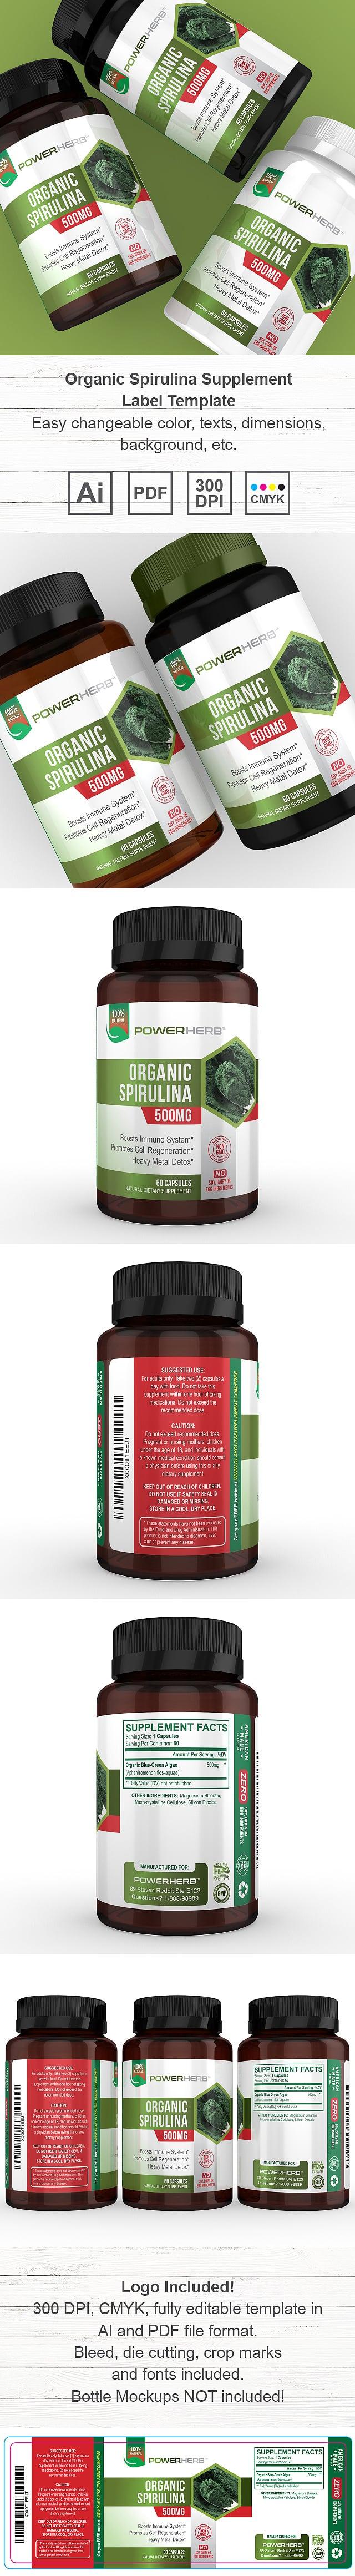 Organic Spirulina Supplement Label Template